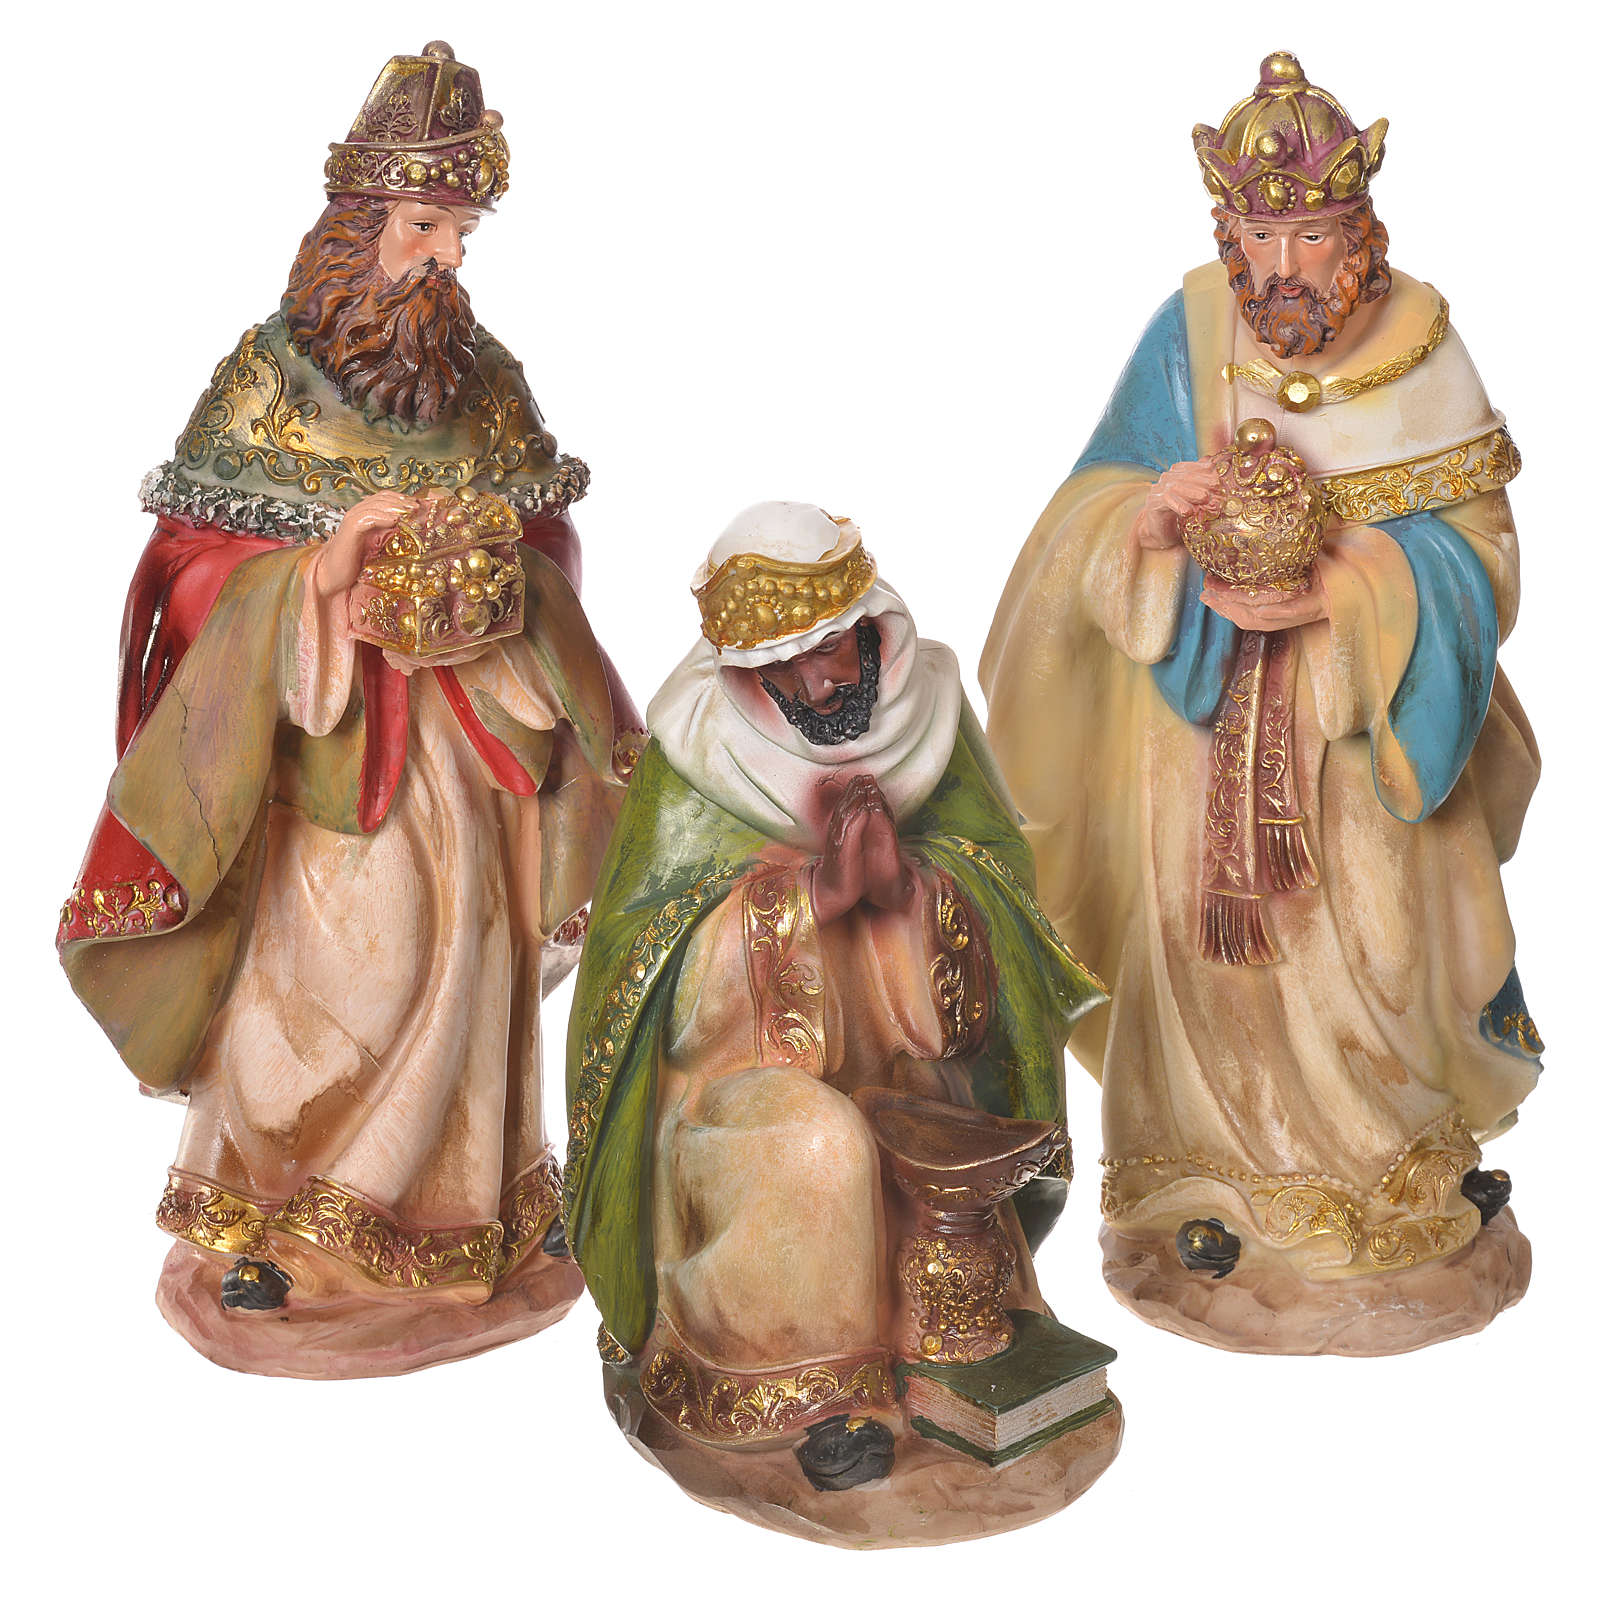 Belén completo resina 31 cm multicolor 11 estatuas 4